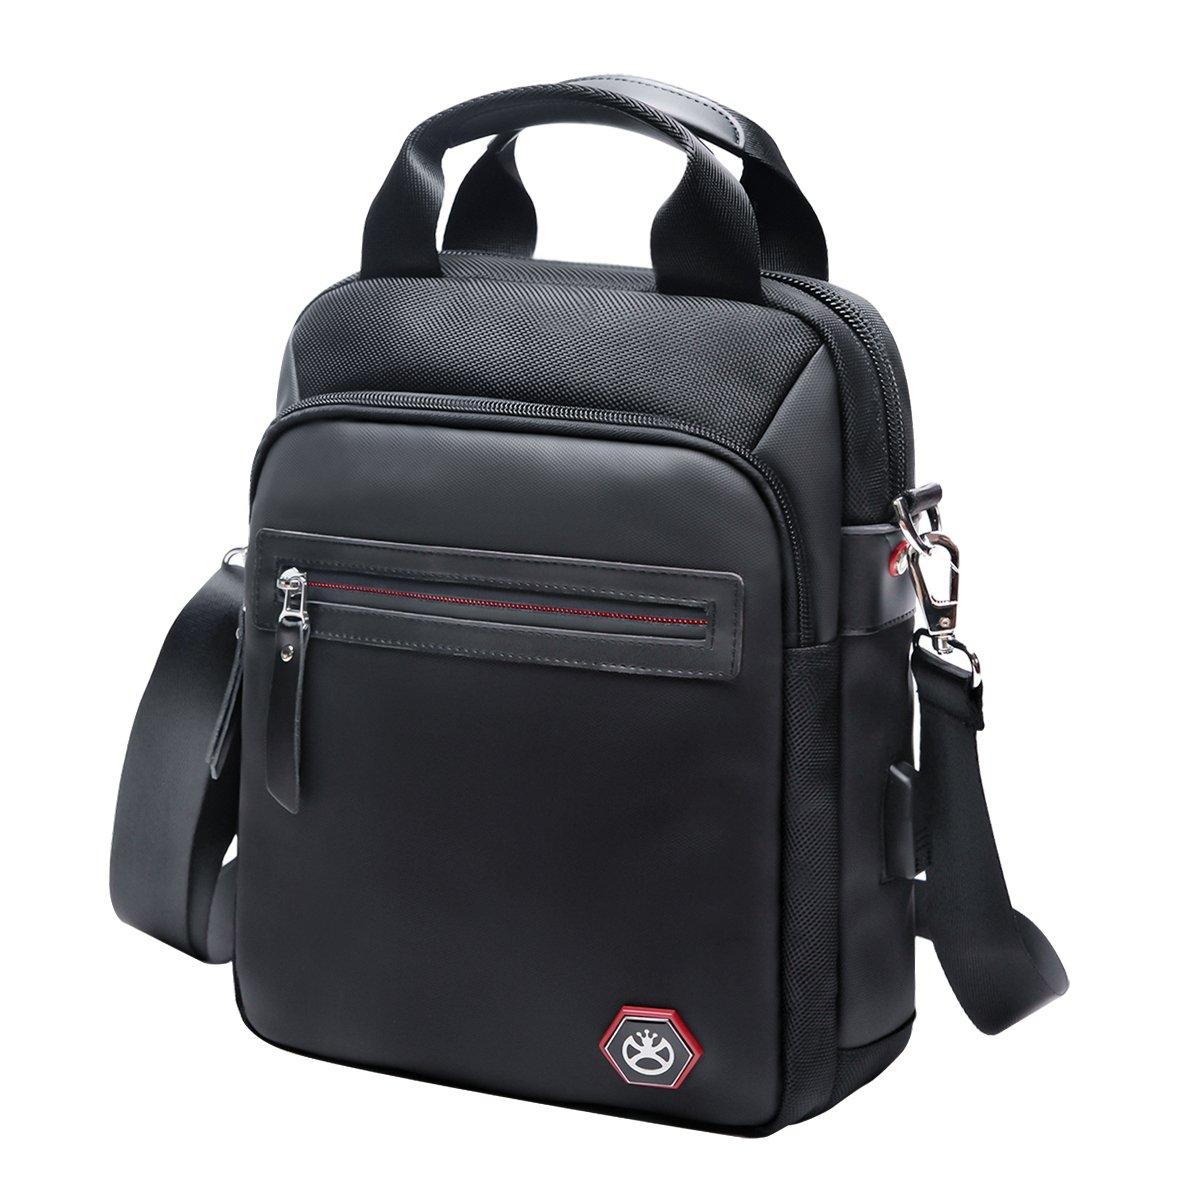 Nylon Crossbody Bag Vertical Messenger Shoulder Bag for Men Waterproof Classic Medium Handbag Business Briefcase Fashion Purse Commute Pack by BOOMRO